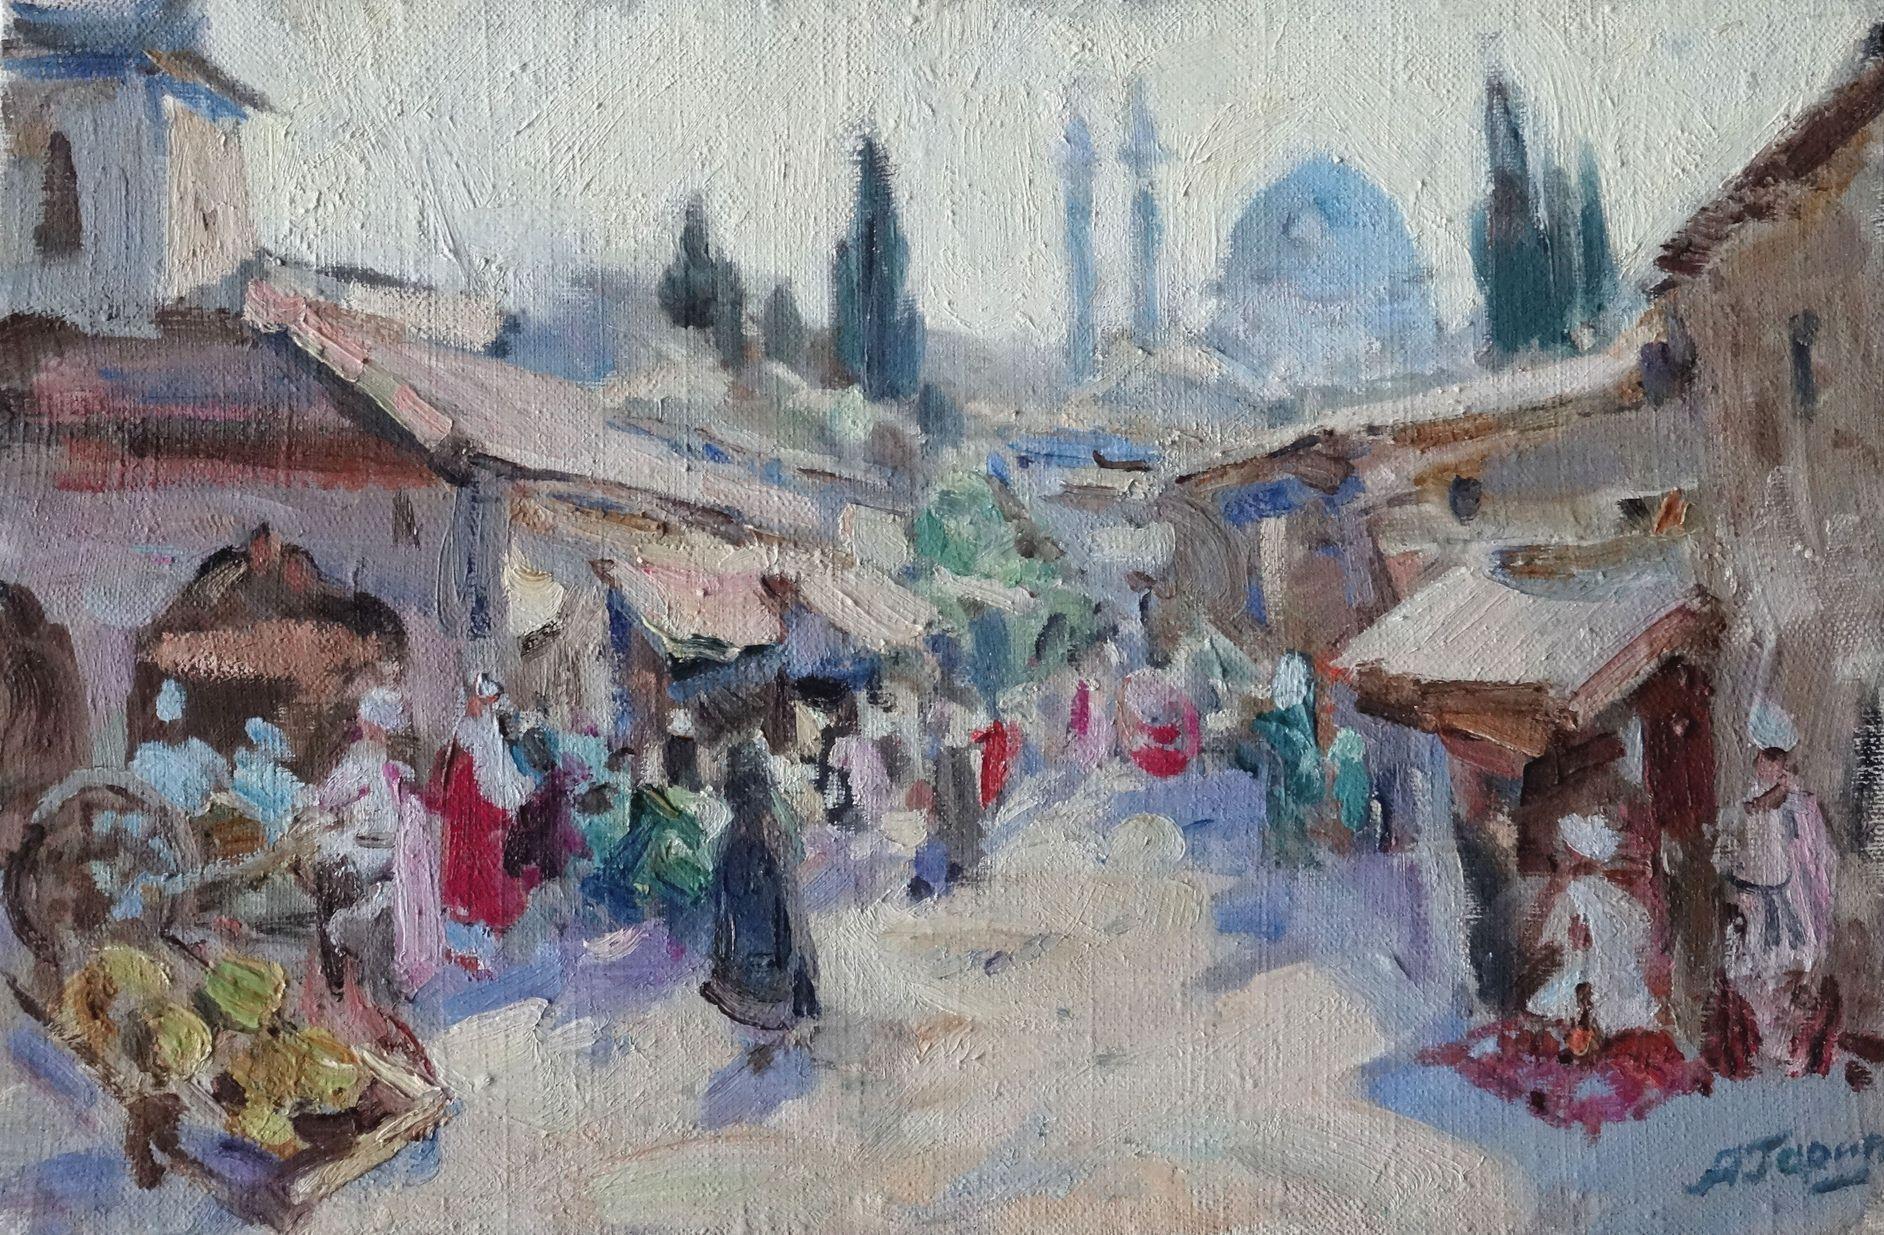 Bukhara. 1995, oil on canvas, 27х41 сm